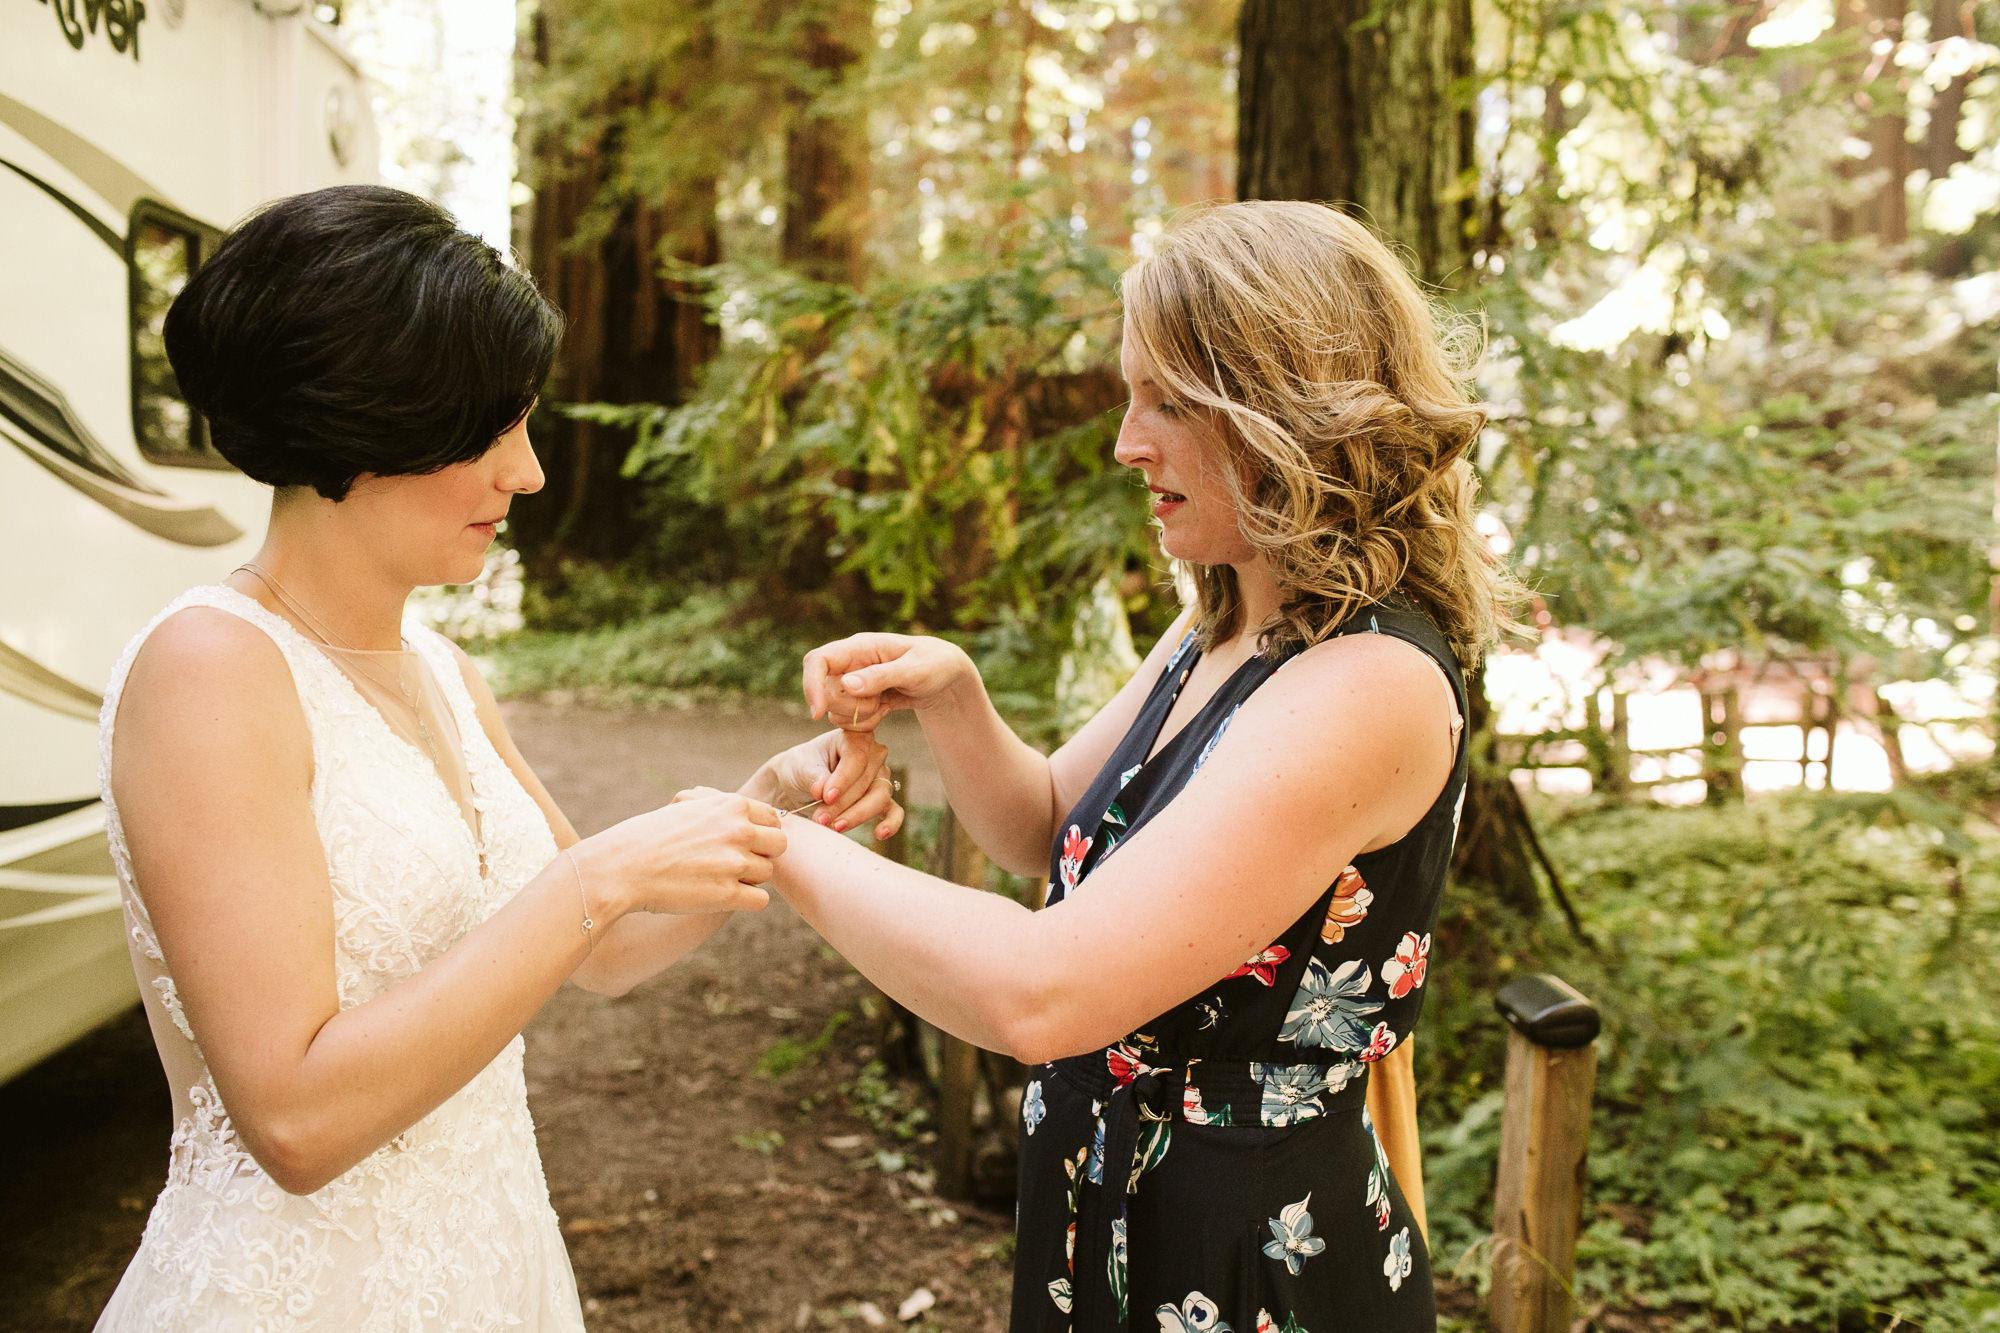 California-wedding-photographer-alfonso-flores-pamplin-groove-150.jpg